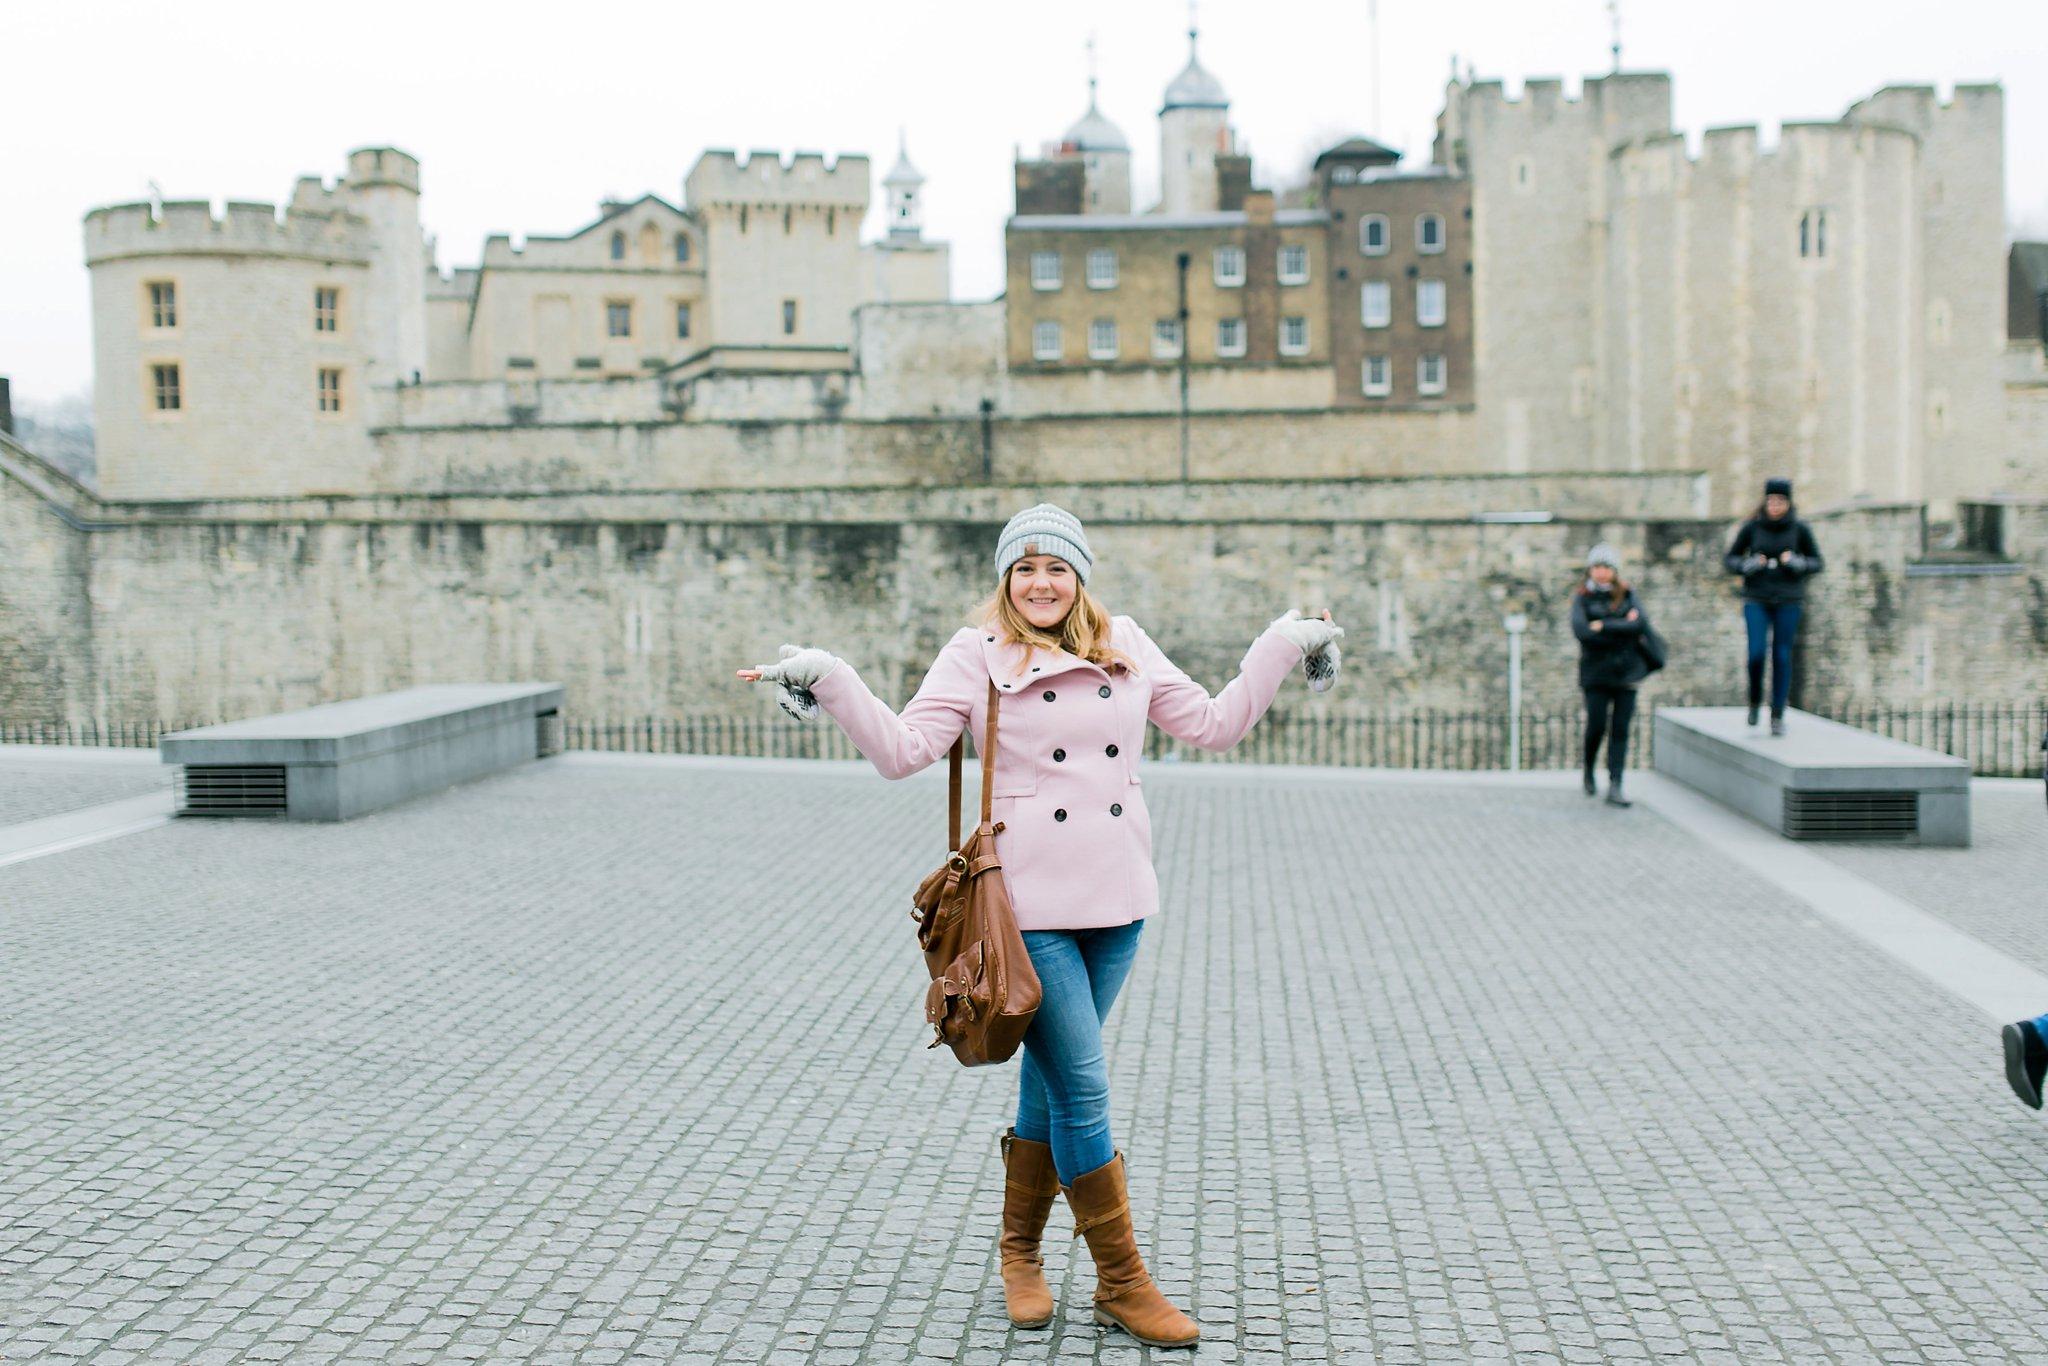 London Part II Westminster Abbey Tower Bridge Tower of London Big Ben-1674.jpg